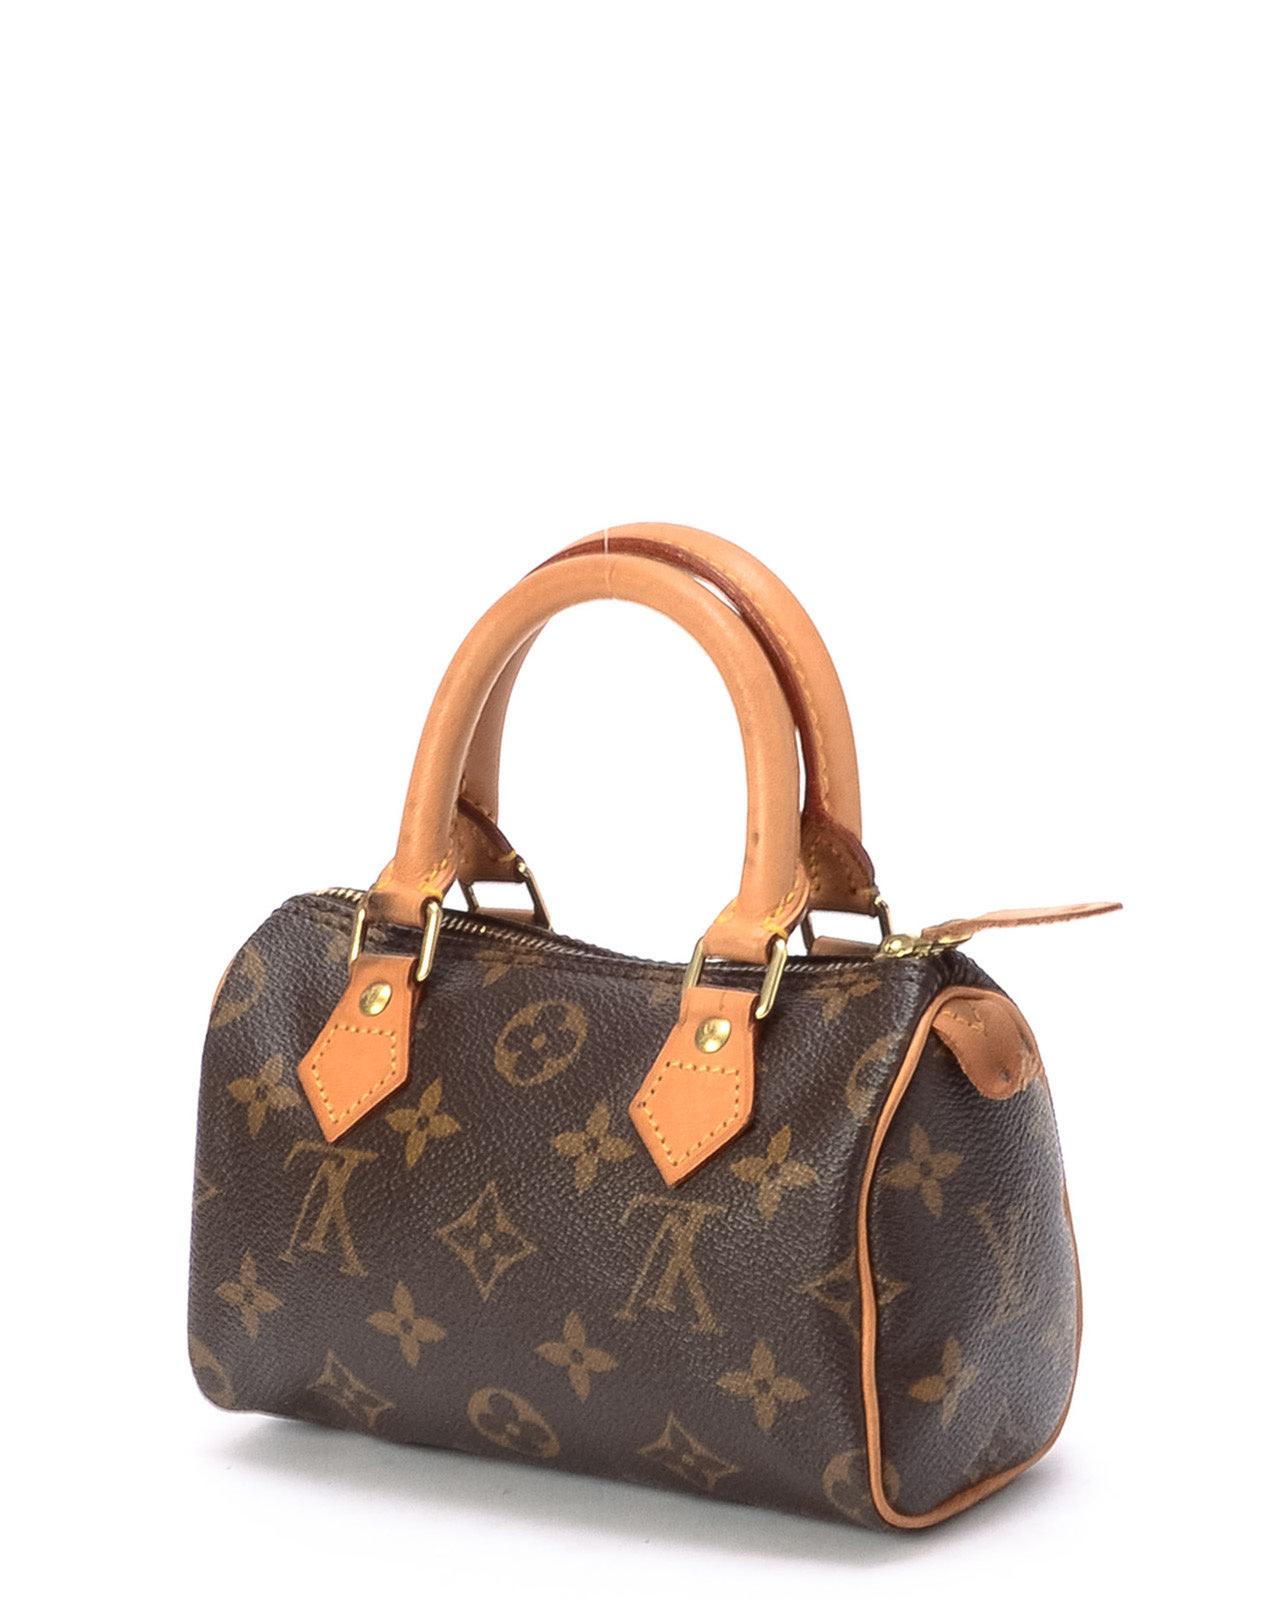 2afa4ed060cd Louis Vuitton Monogram Mini Speedy Handbag in Brown - Lyst